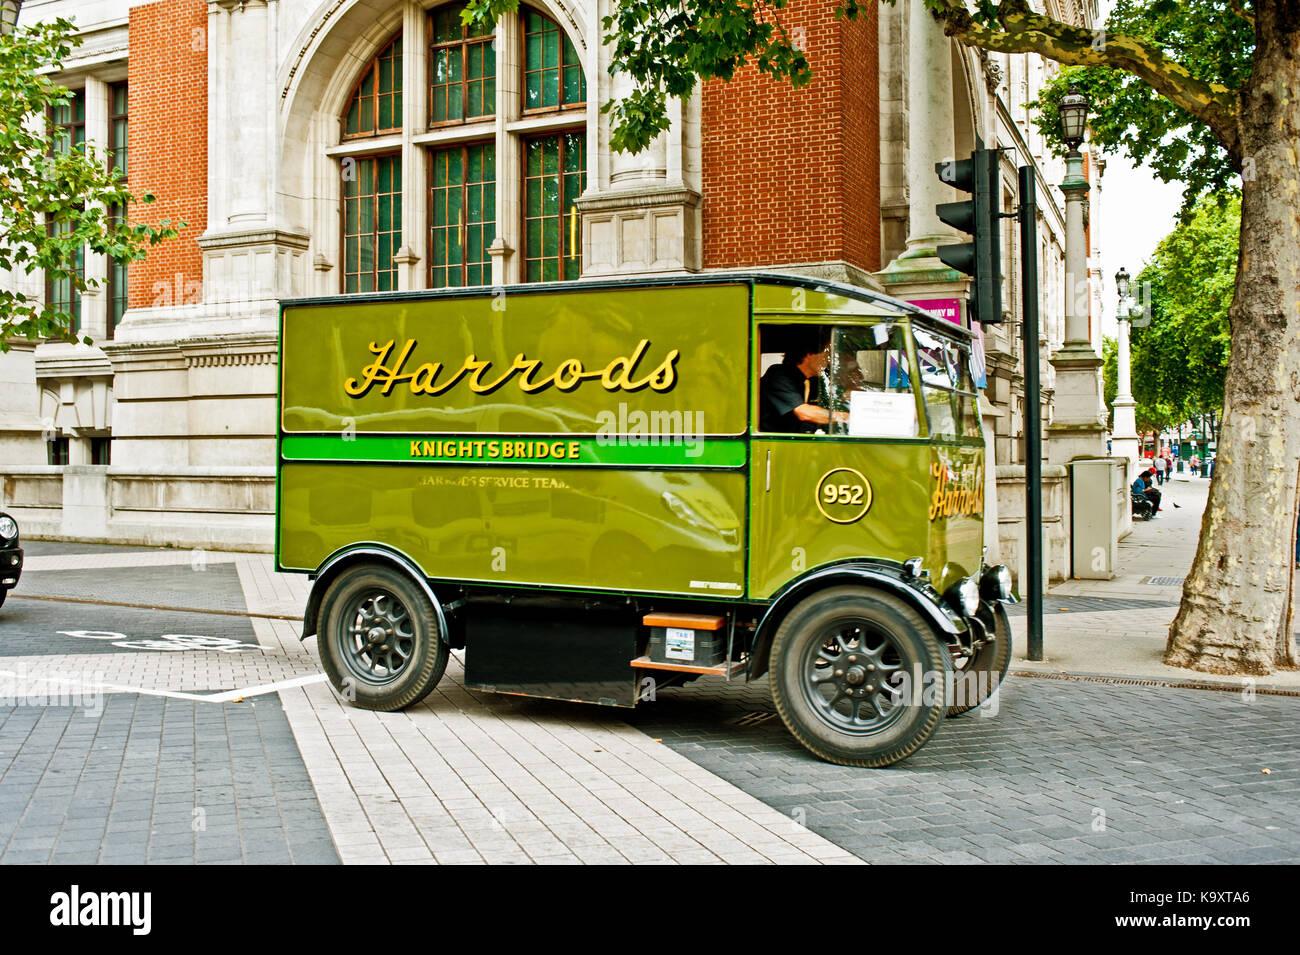 Harrods Van, Cromwell Road, Royal Borough of Chelsea London - Stock Image